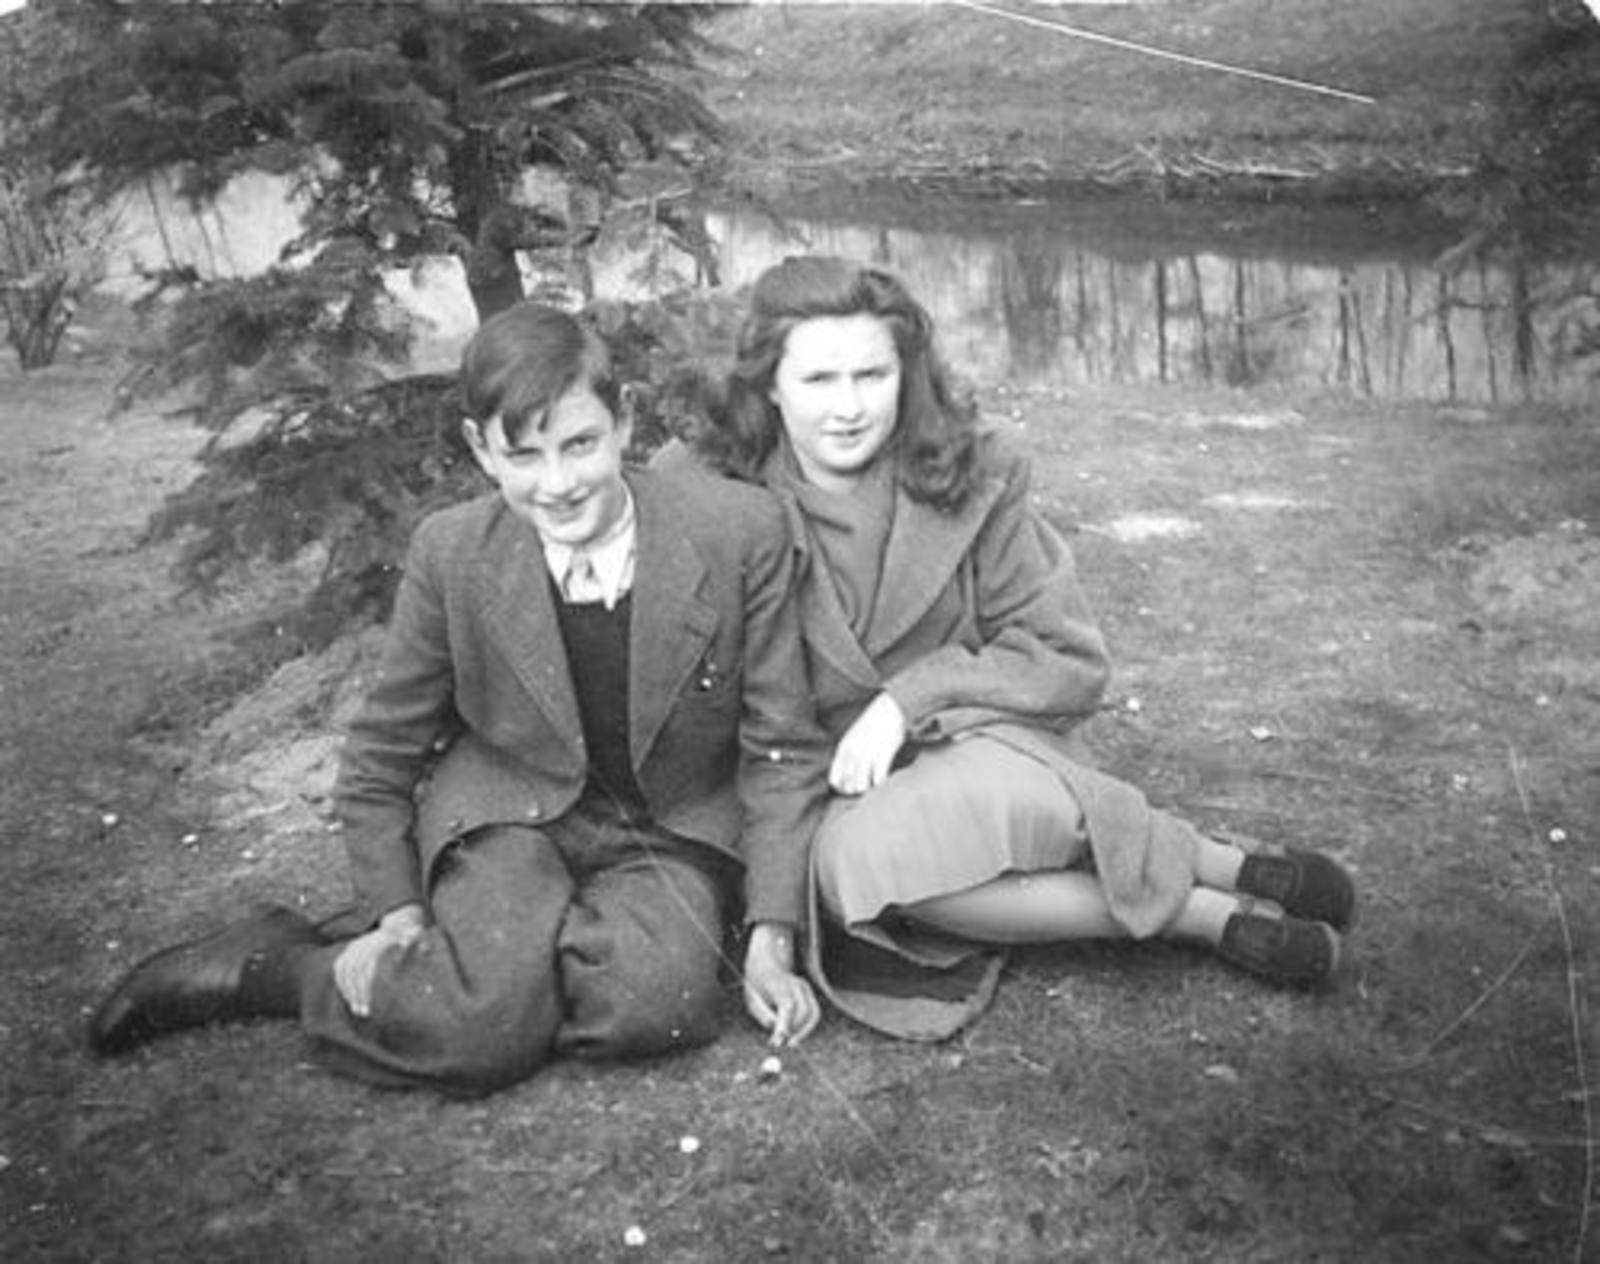 Koeckhoven Theo 1932 1947 met zus Ria langs Slootkant